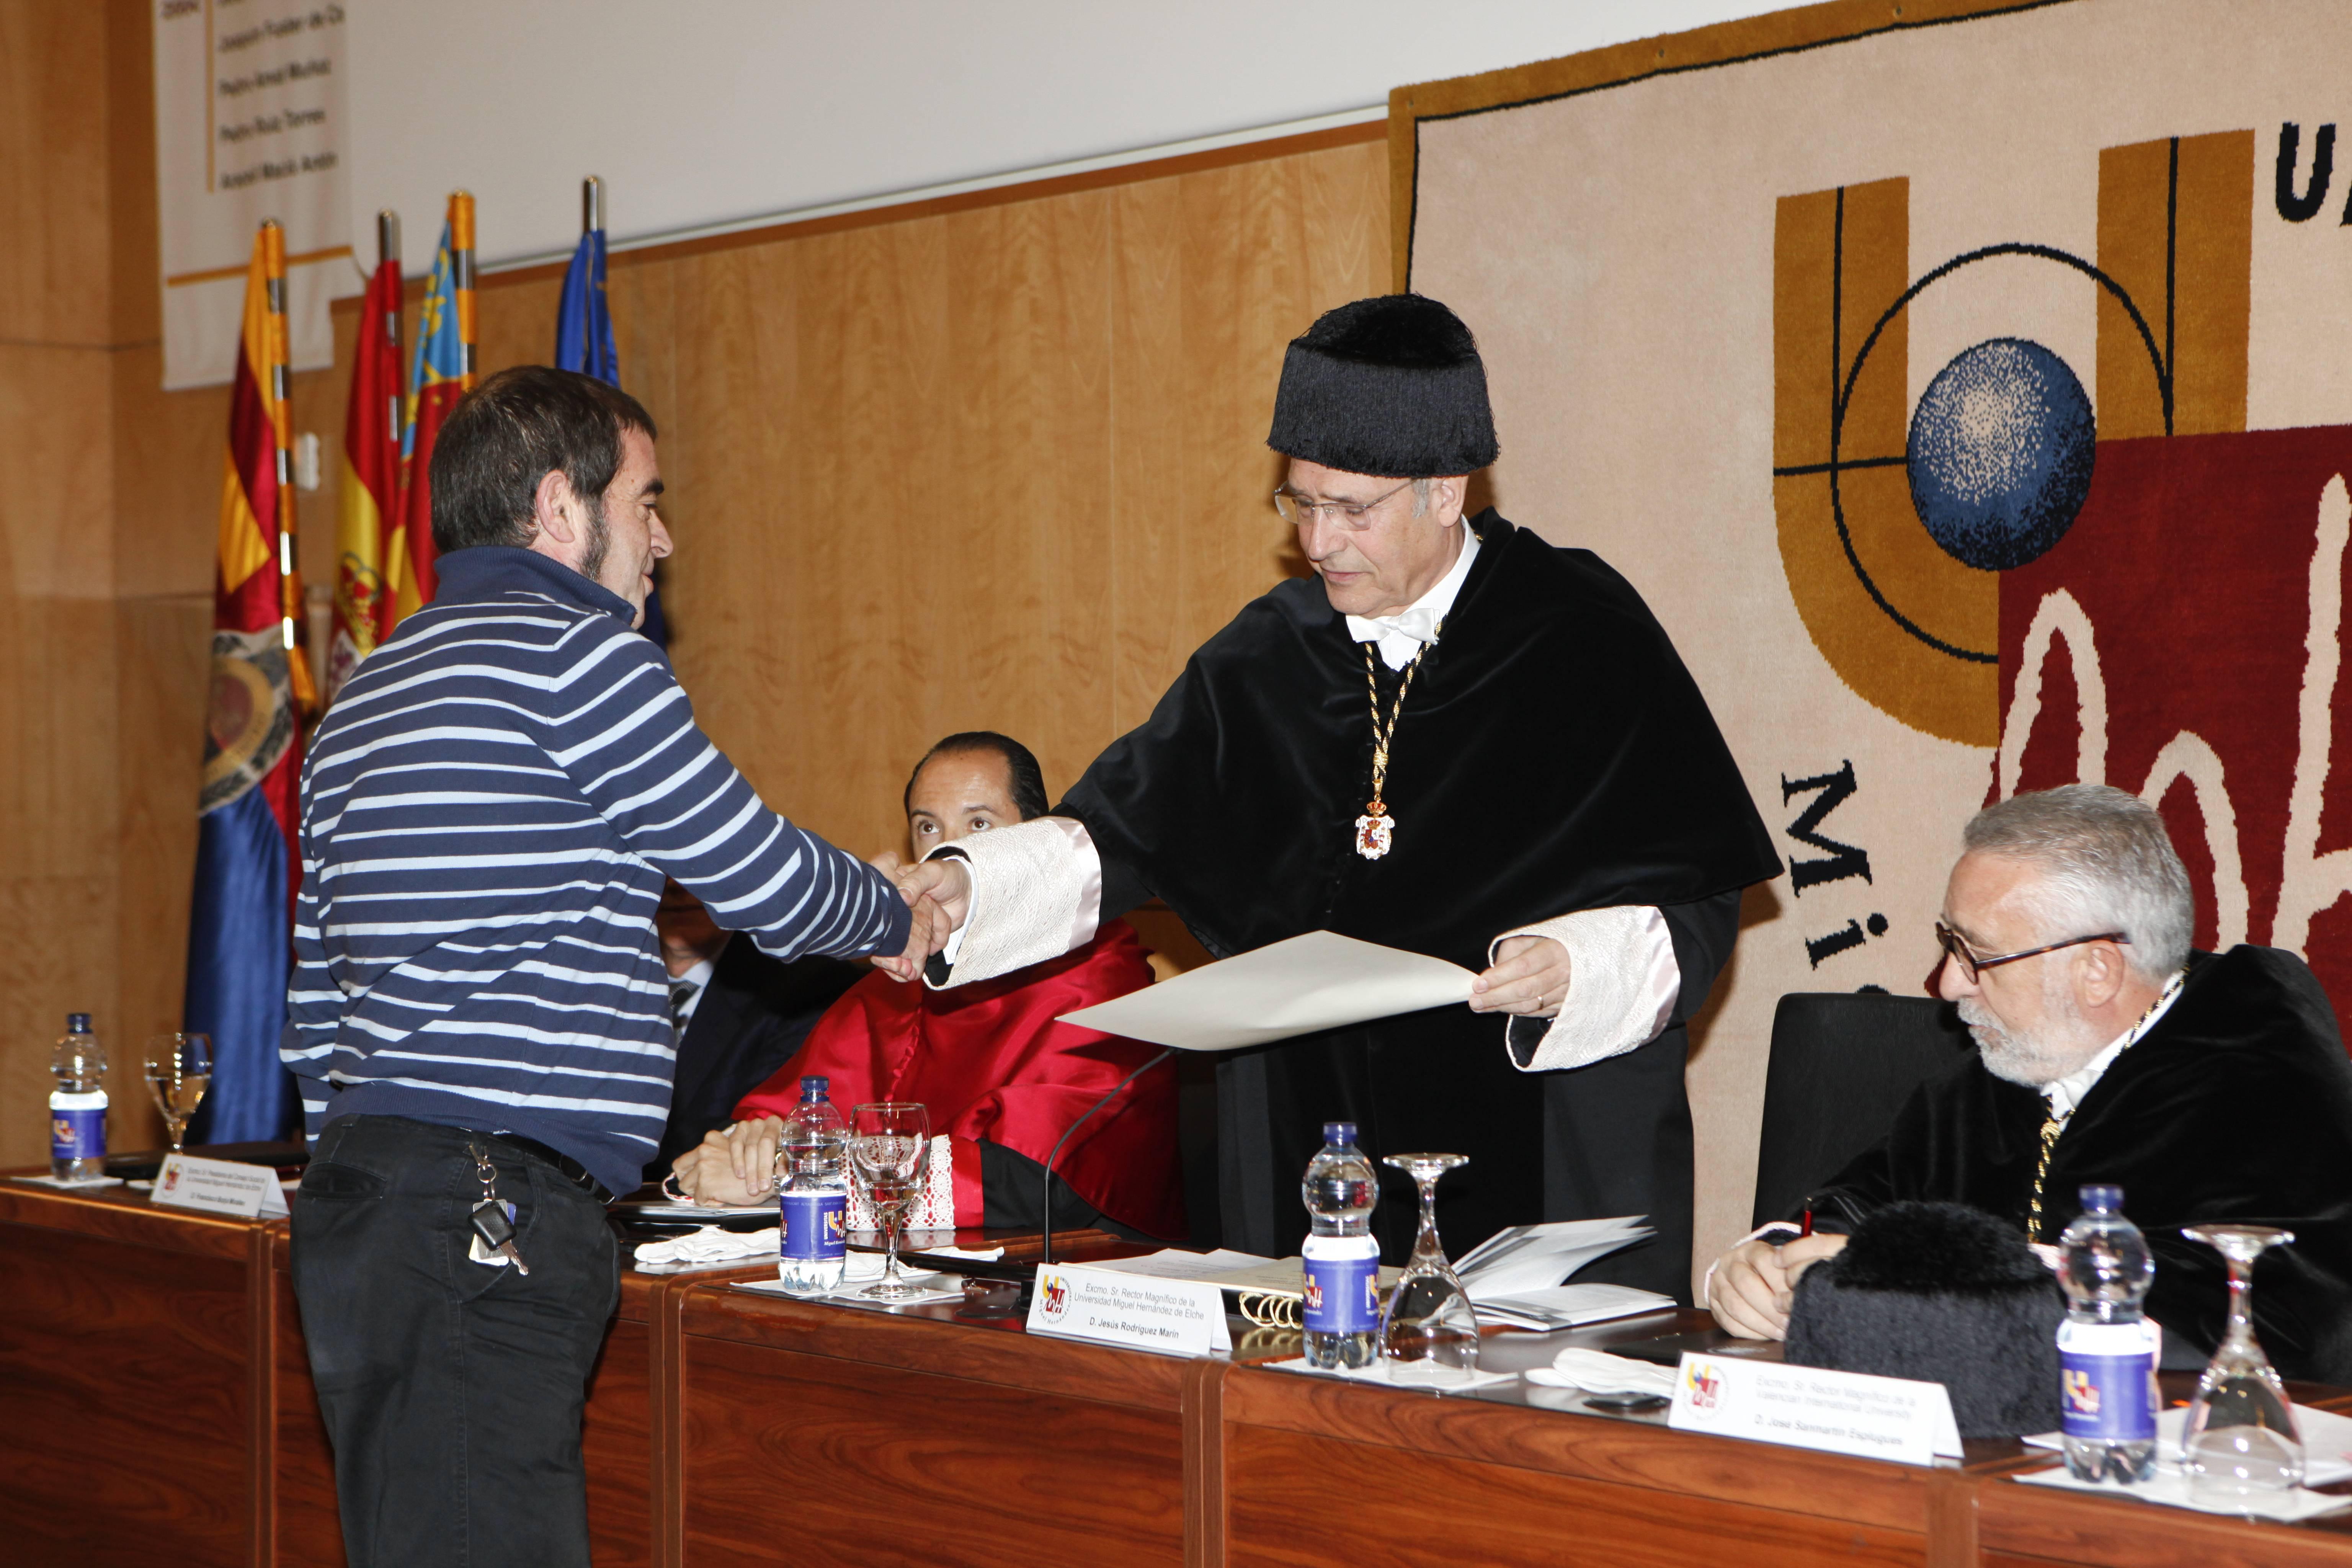 doctor-honoris-causa-luis-gamir_mg_0920.jpg